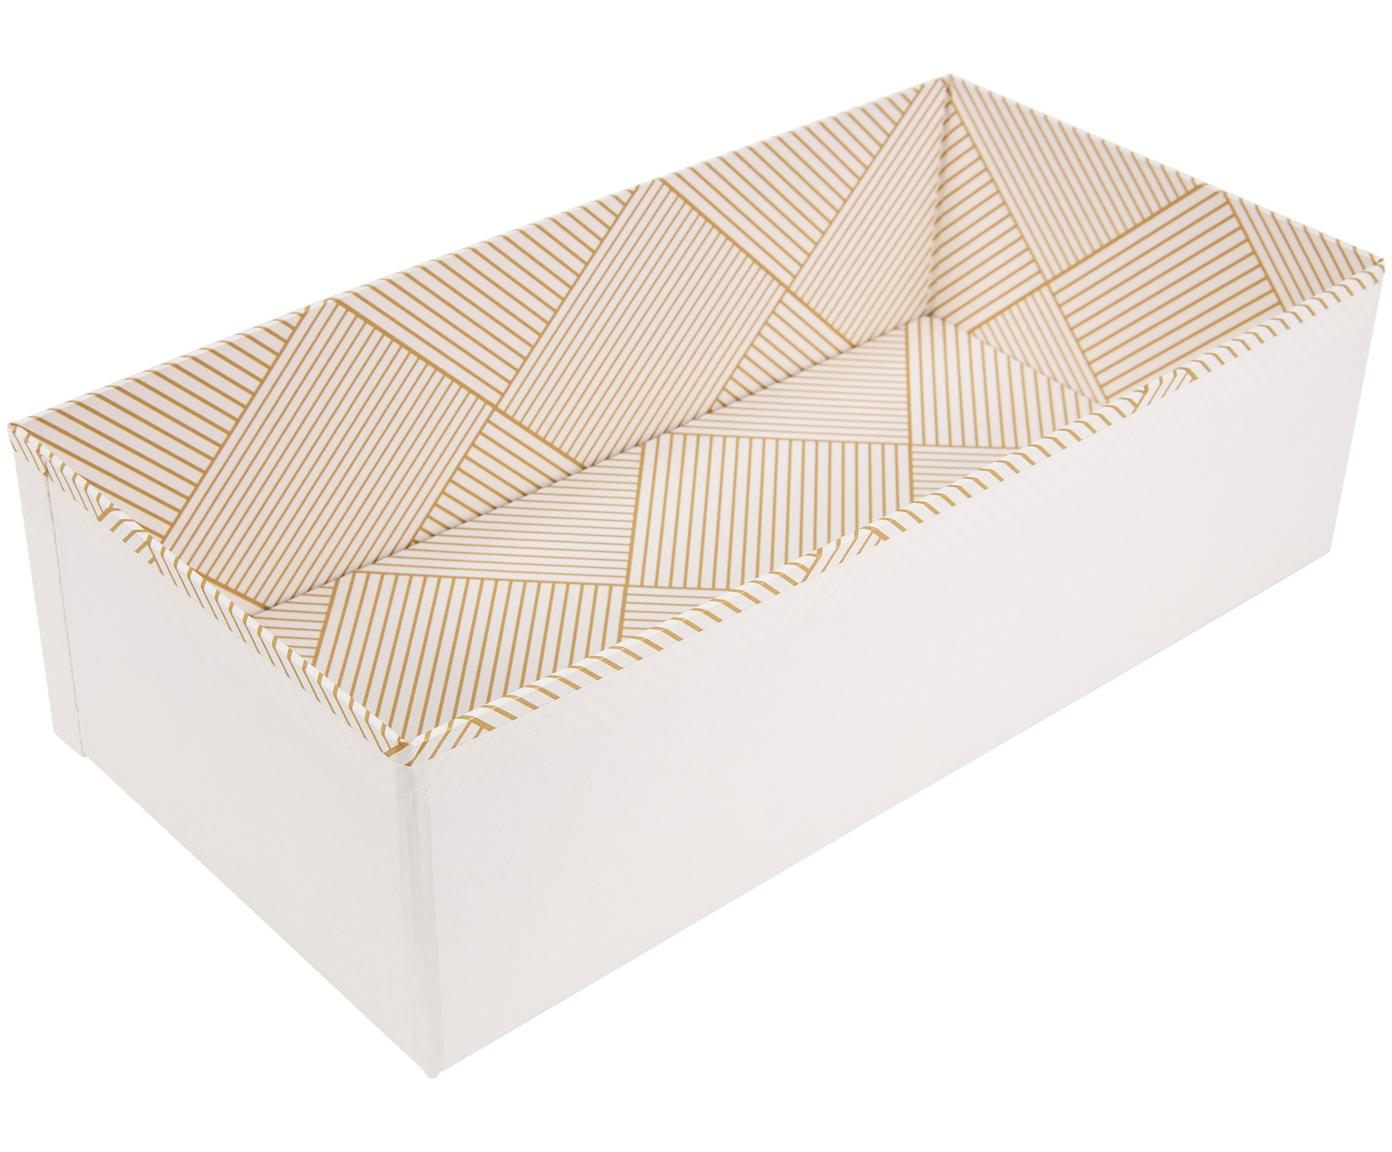 Organizer Drawer, Solido, cartone laminato, Dorato, bianco, Larg. 36 x Alt. 10 cm